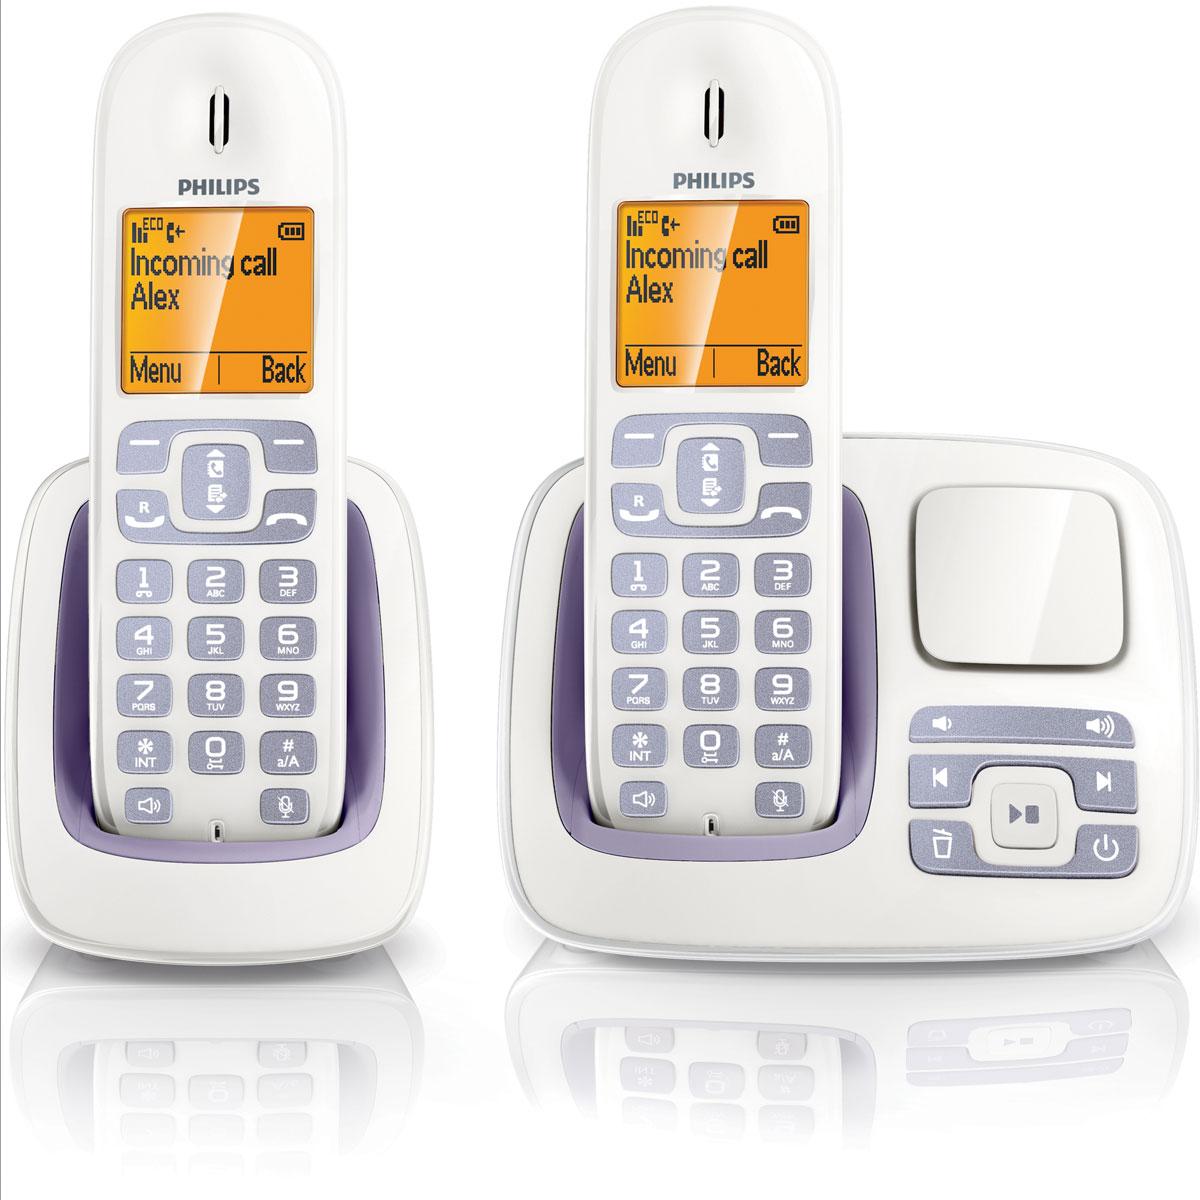 philips cd2952 duo blanc lila t l phone sans fil philips sur ldlc. Black Bedroom Furniture Sets. Home Design Ideas